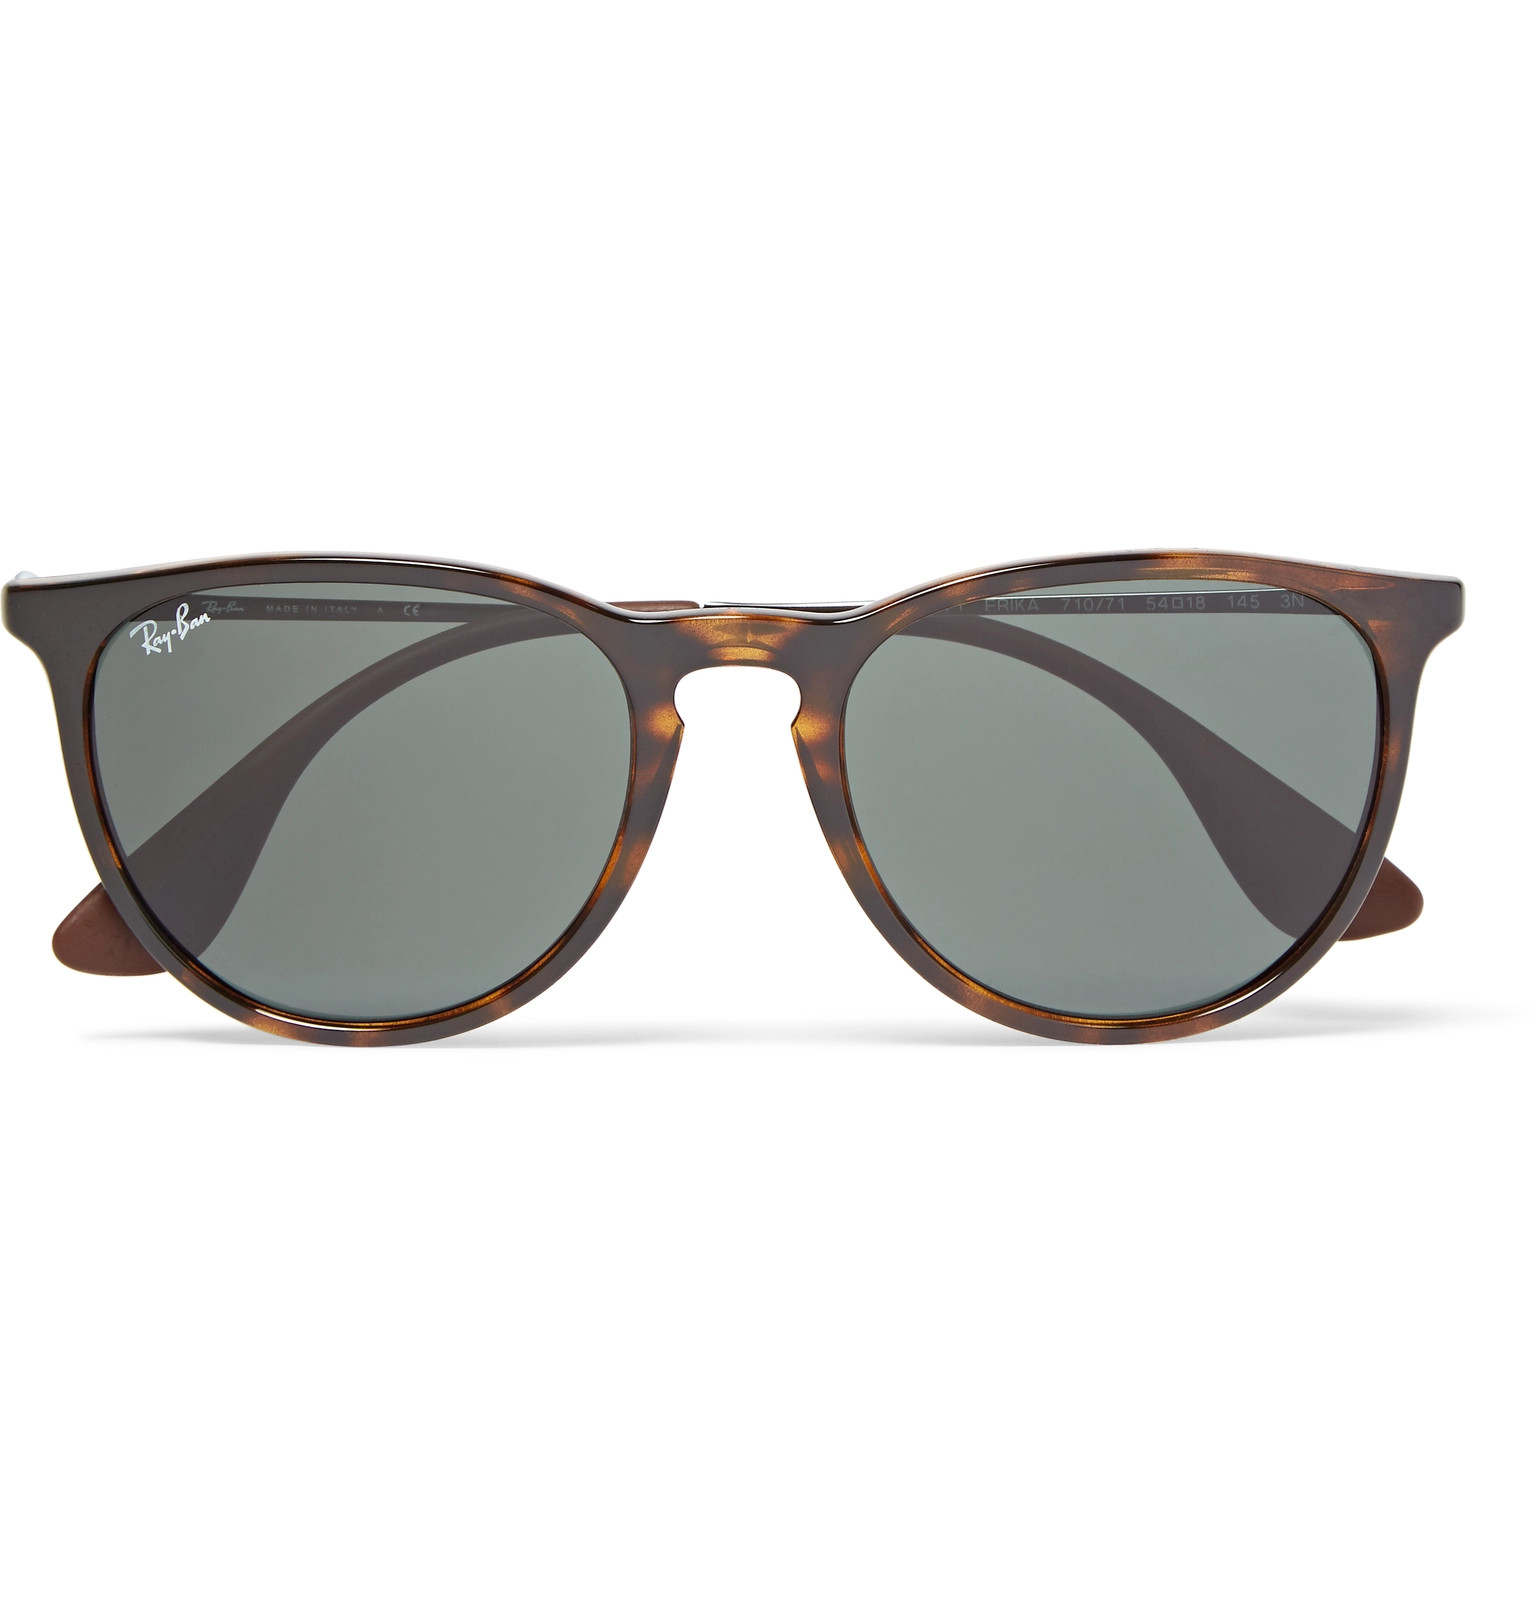 e9561cf620 Ray-Ban - Erika Round-Frame Tortoiseshell Acetate Sunglasses